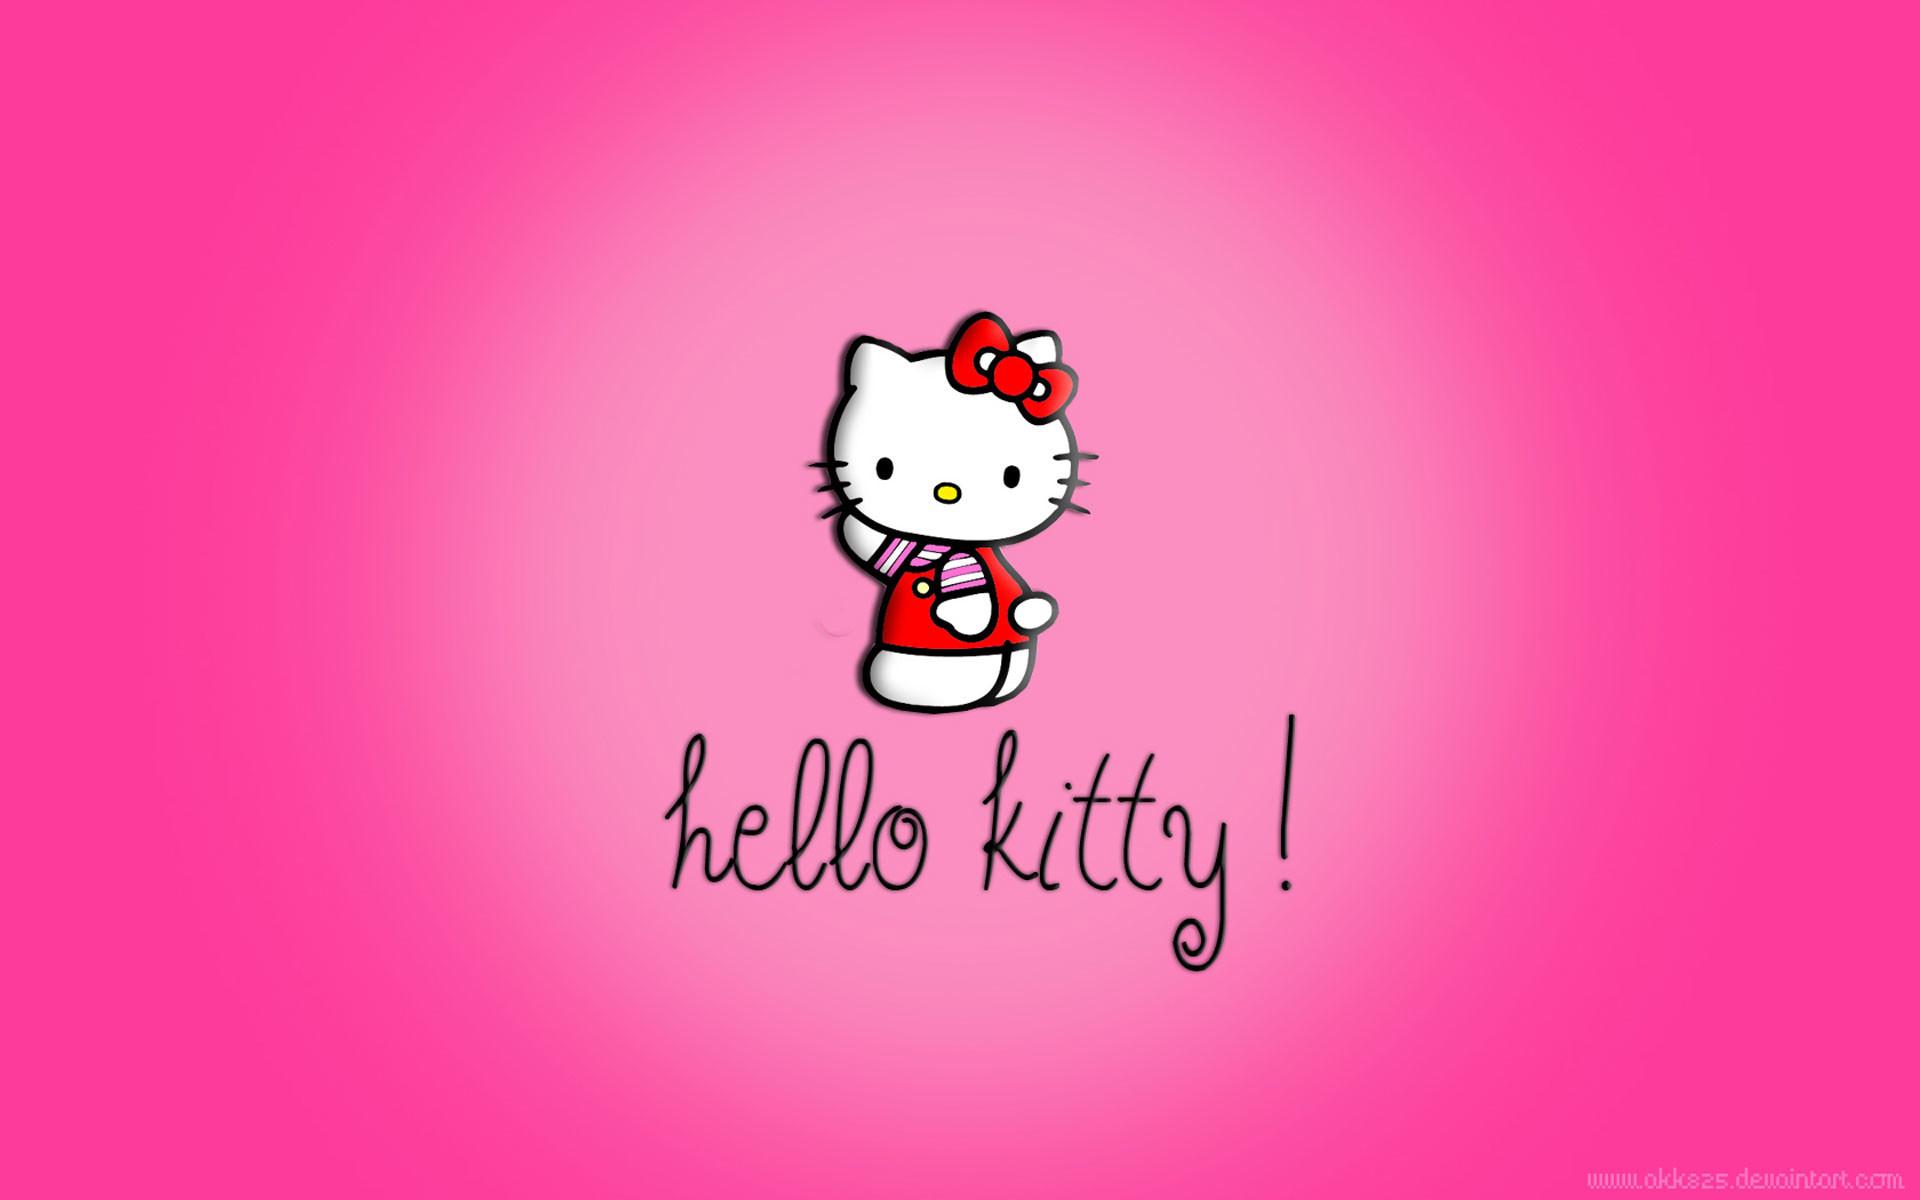 Top Wallpaper Hello Kitty Computer - 724788-gorgerous-hello-kitty-wallpaper-for-pc-1920x1200-for-samsung  2018_655811.jpg